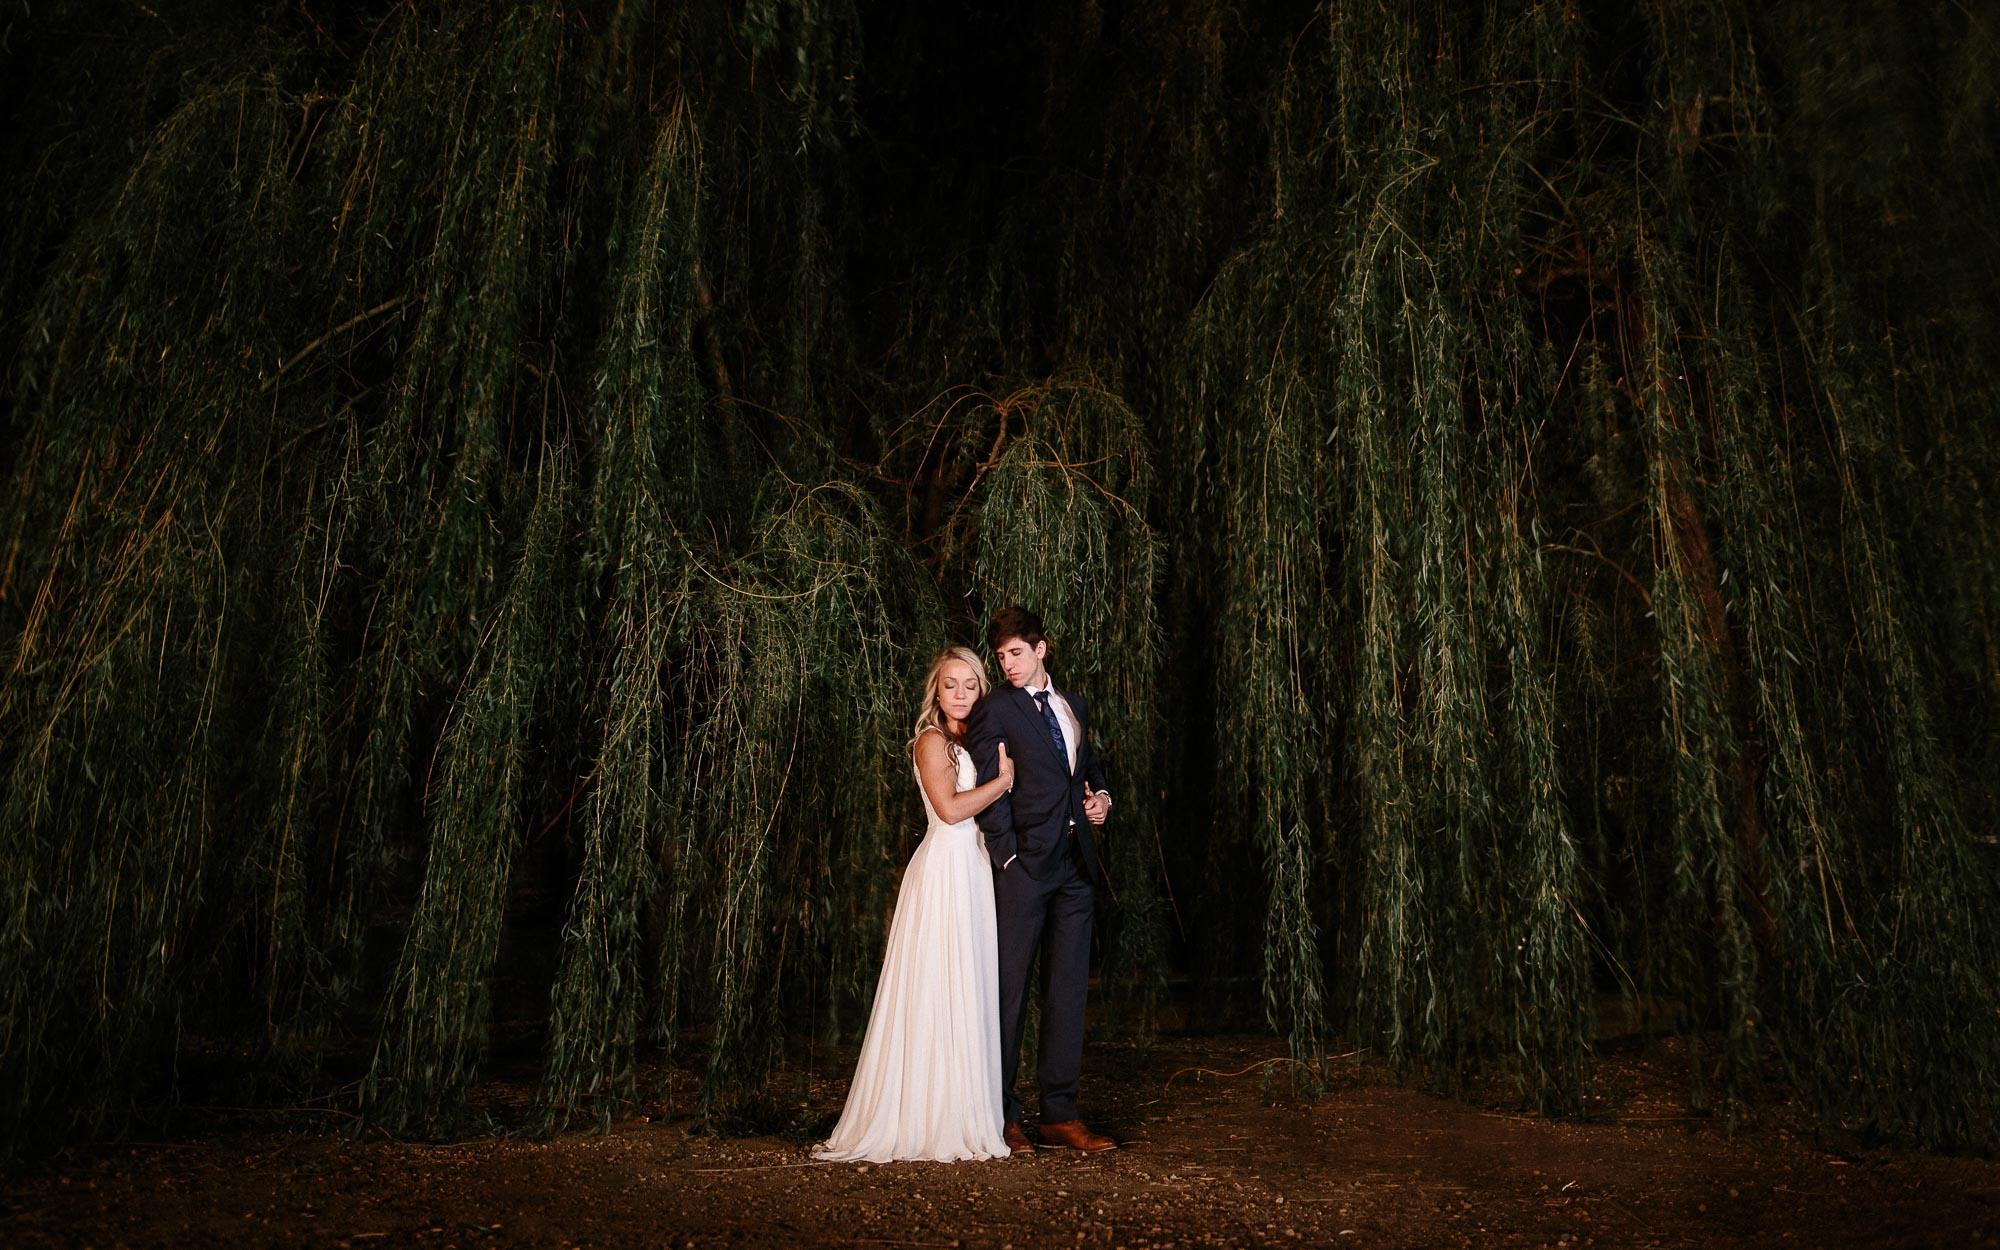 Intimate_Farmhouse_SD_Wedding_Bridgette_Philip_084-2.jpg